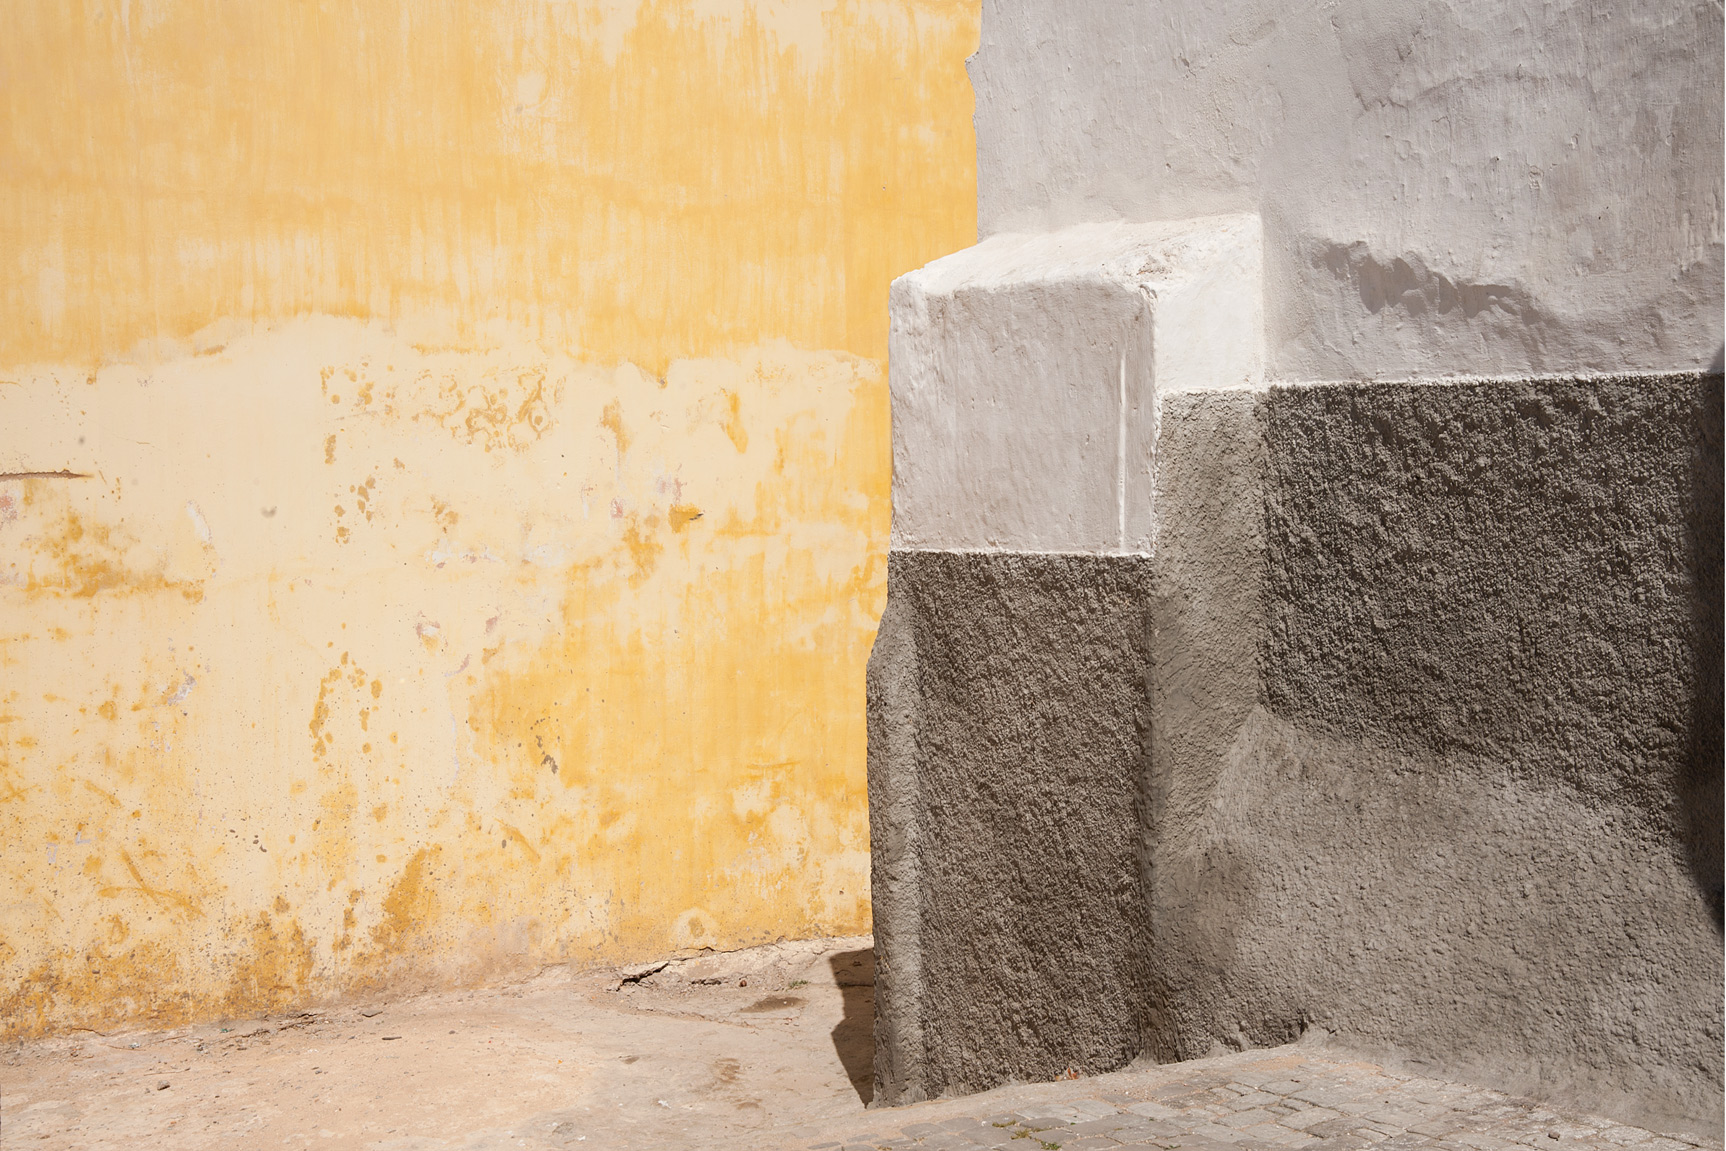 Street I, Morocco (010001)